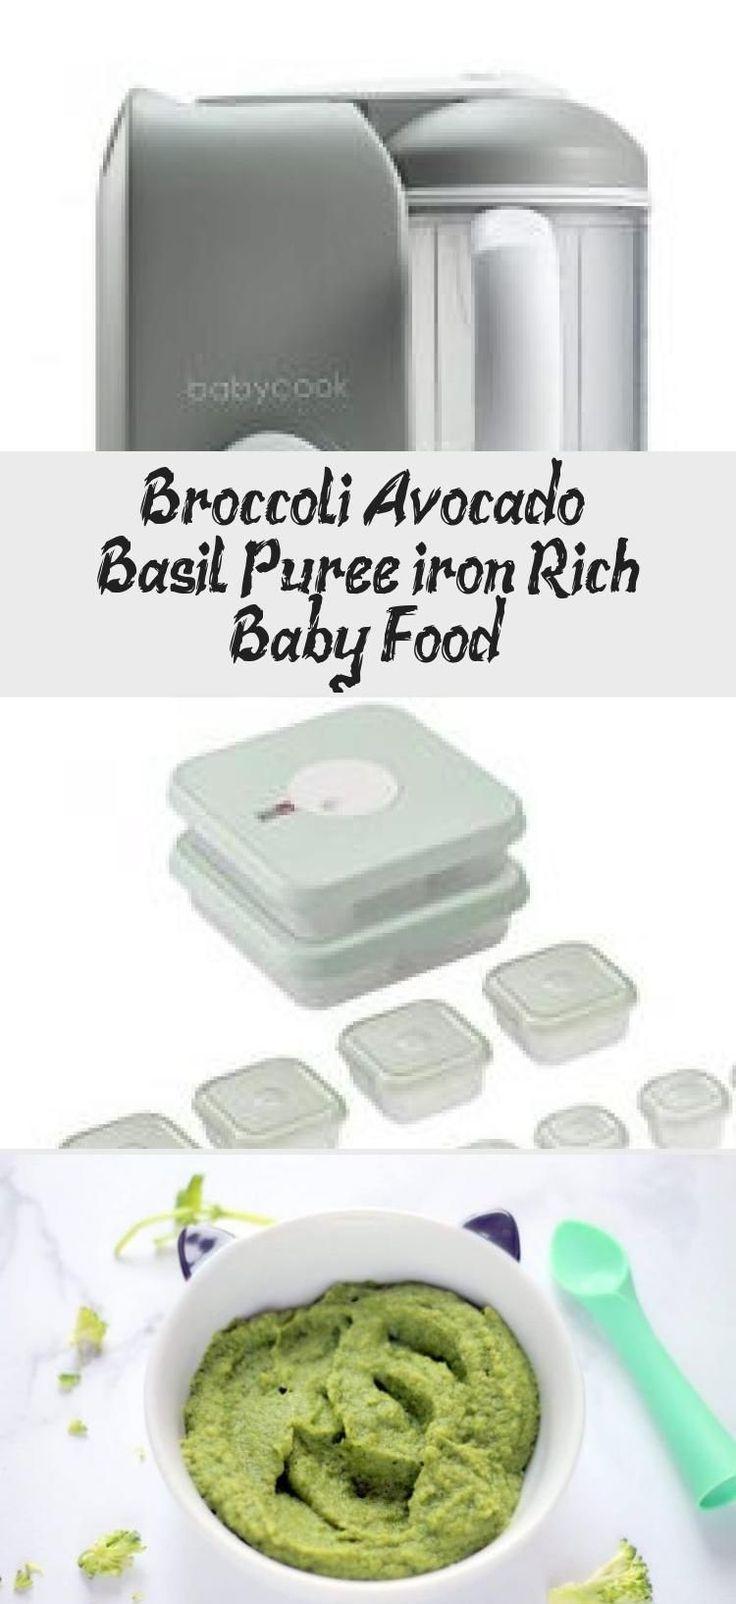 Broccoli avocado basil puree iron rich baby food